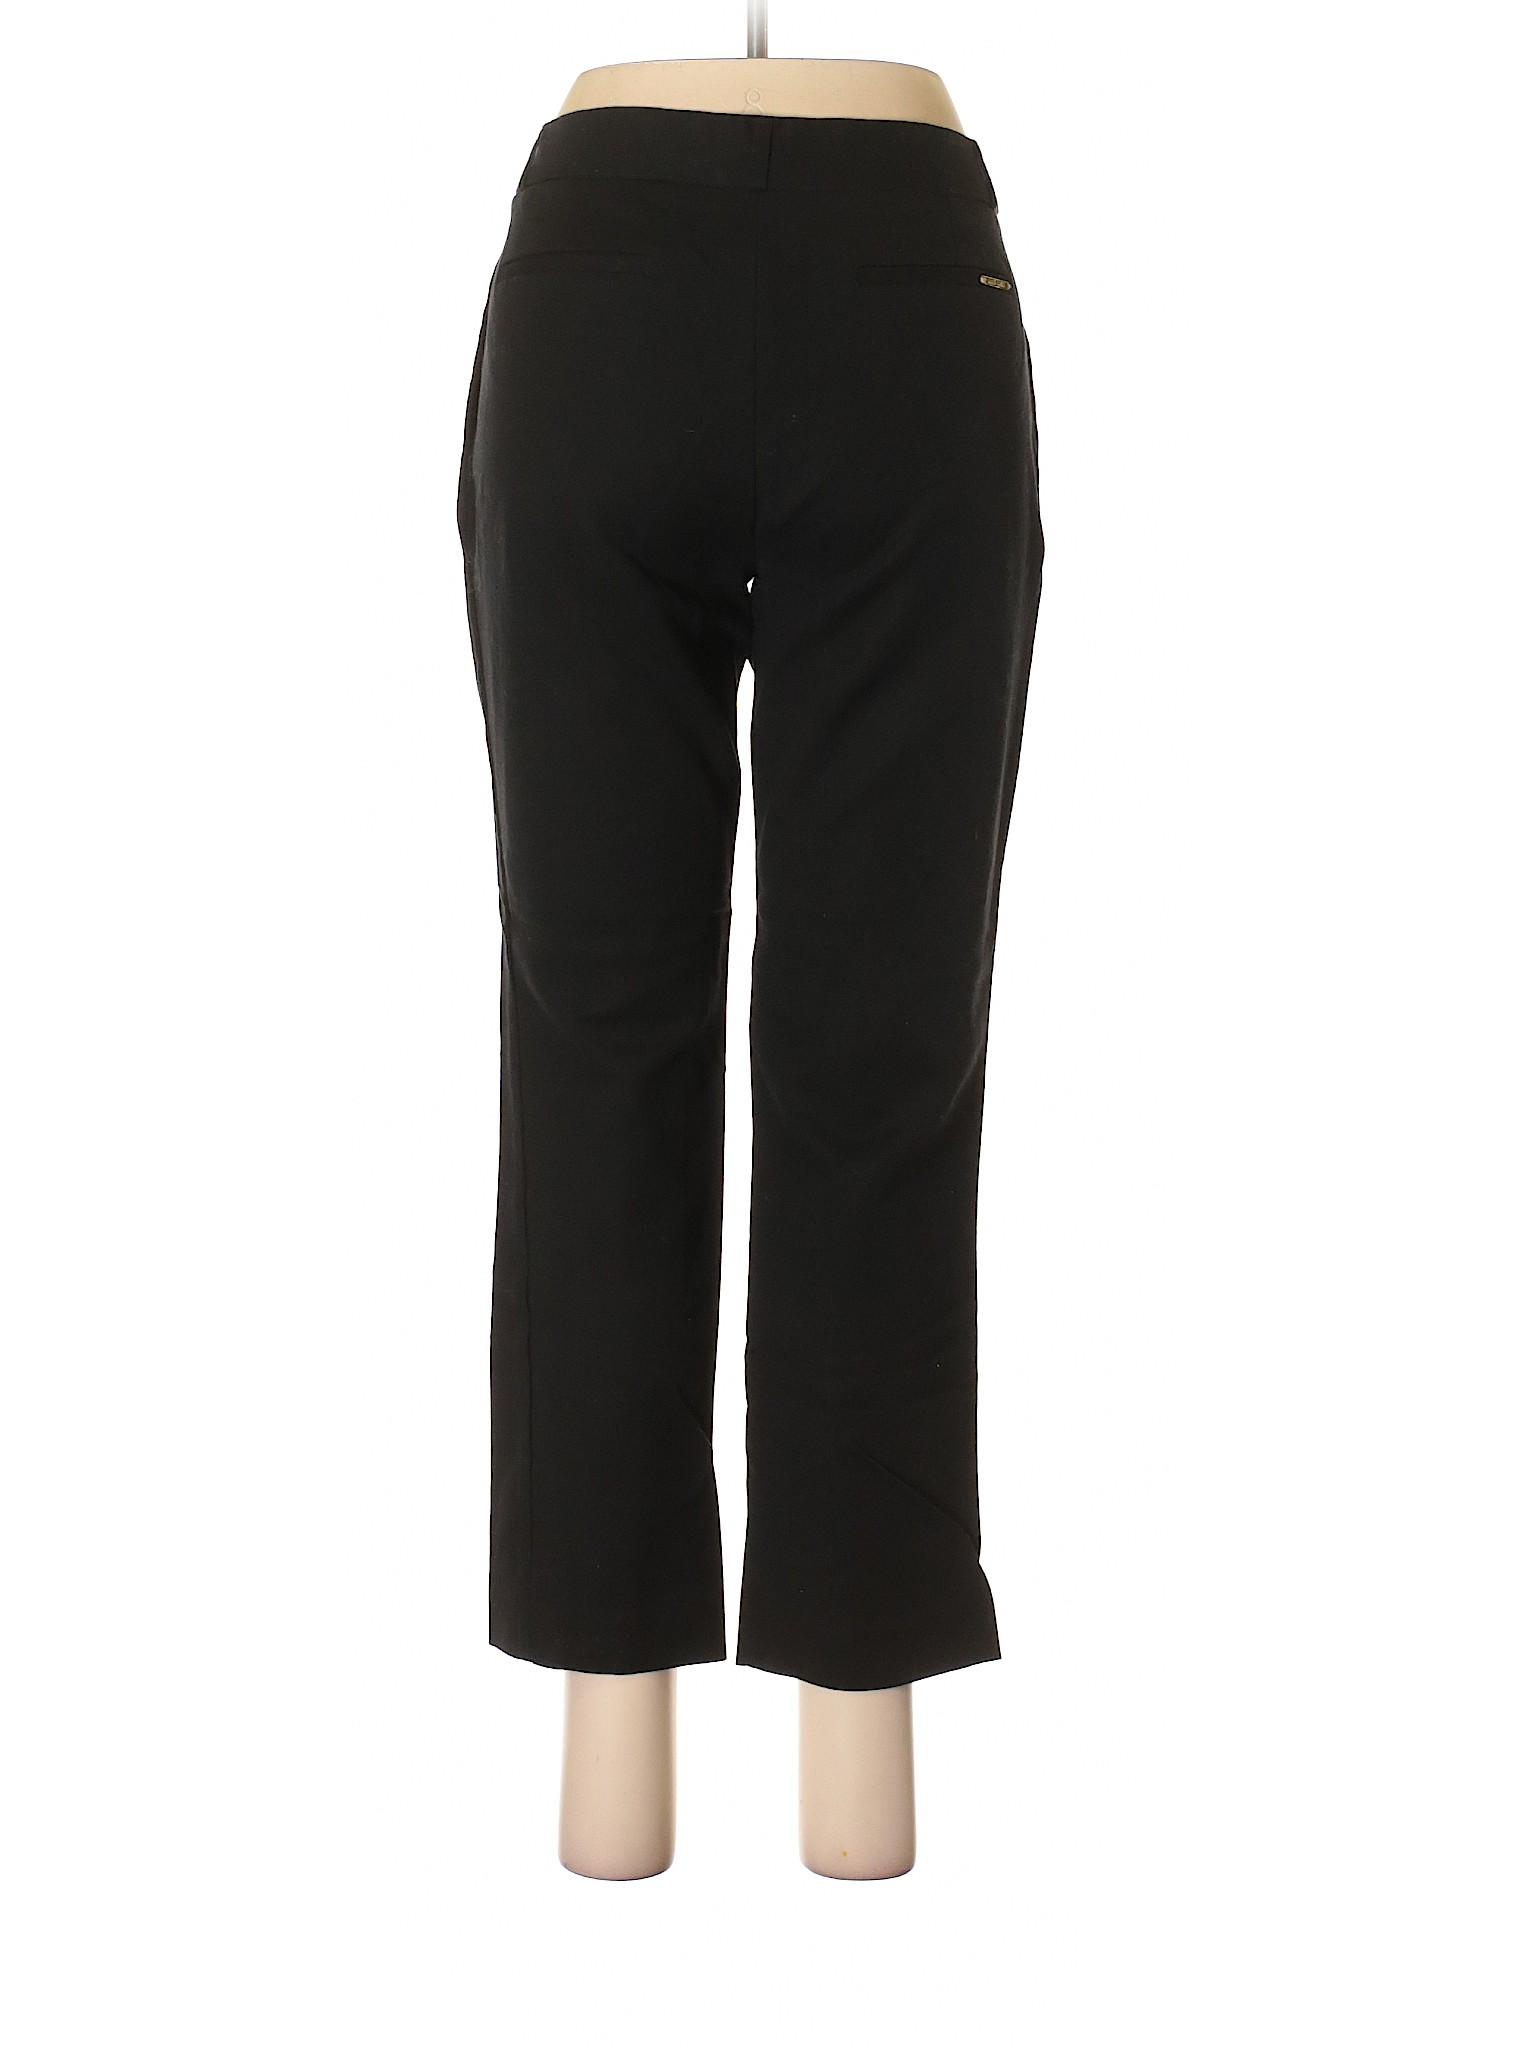 Boutique Pants Klein Casual leisure Anne 1gqrfwF1xH